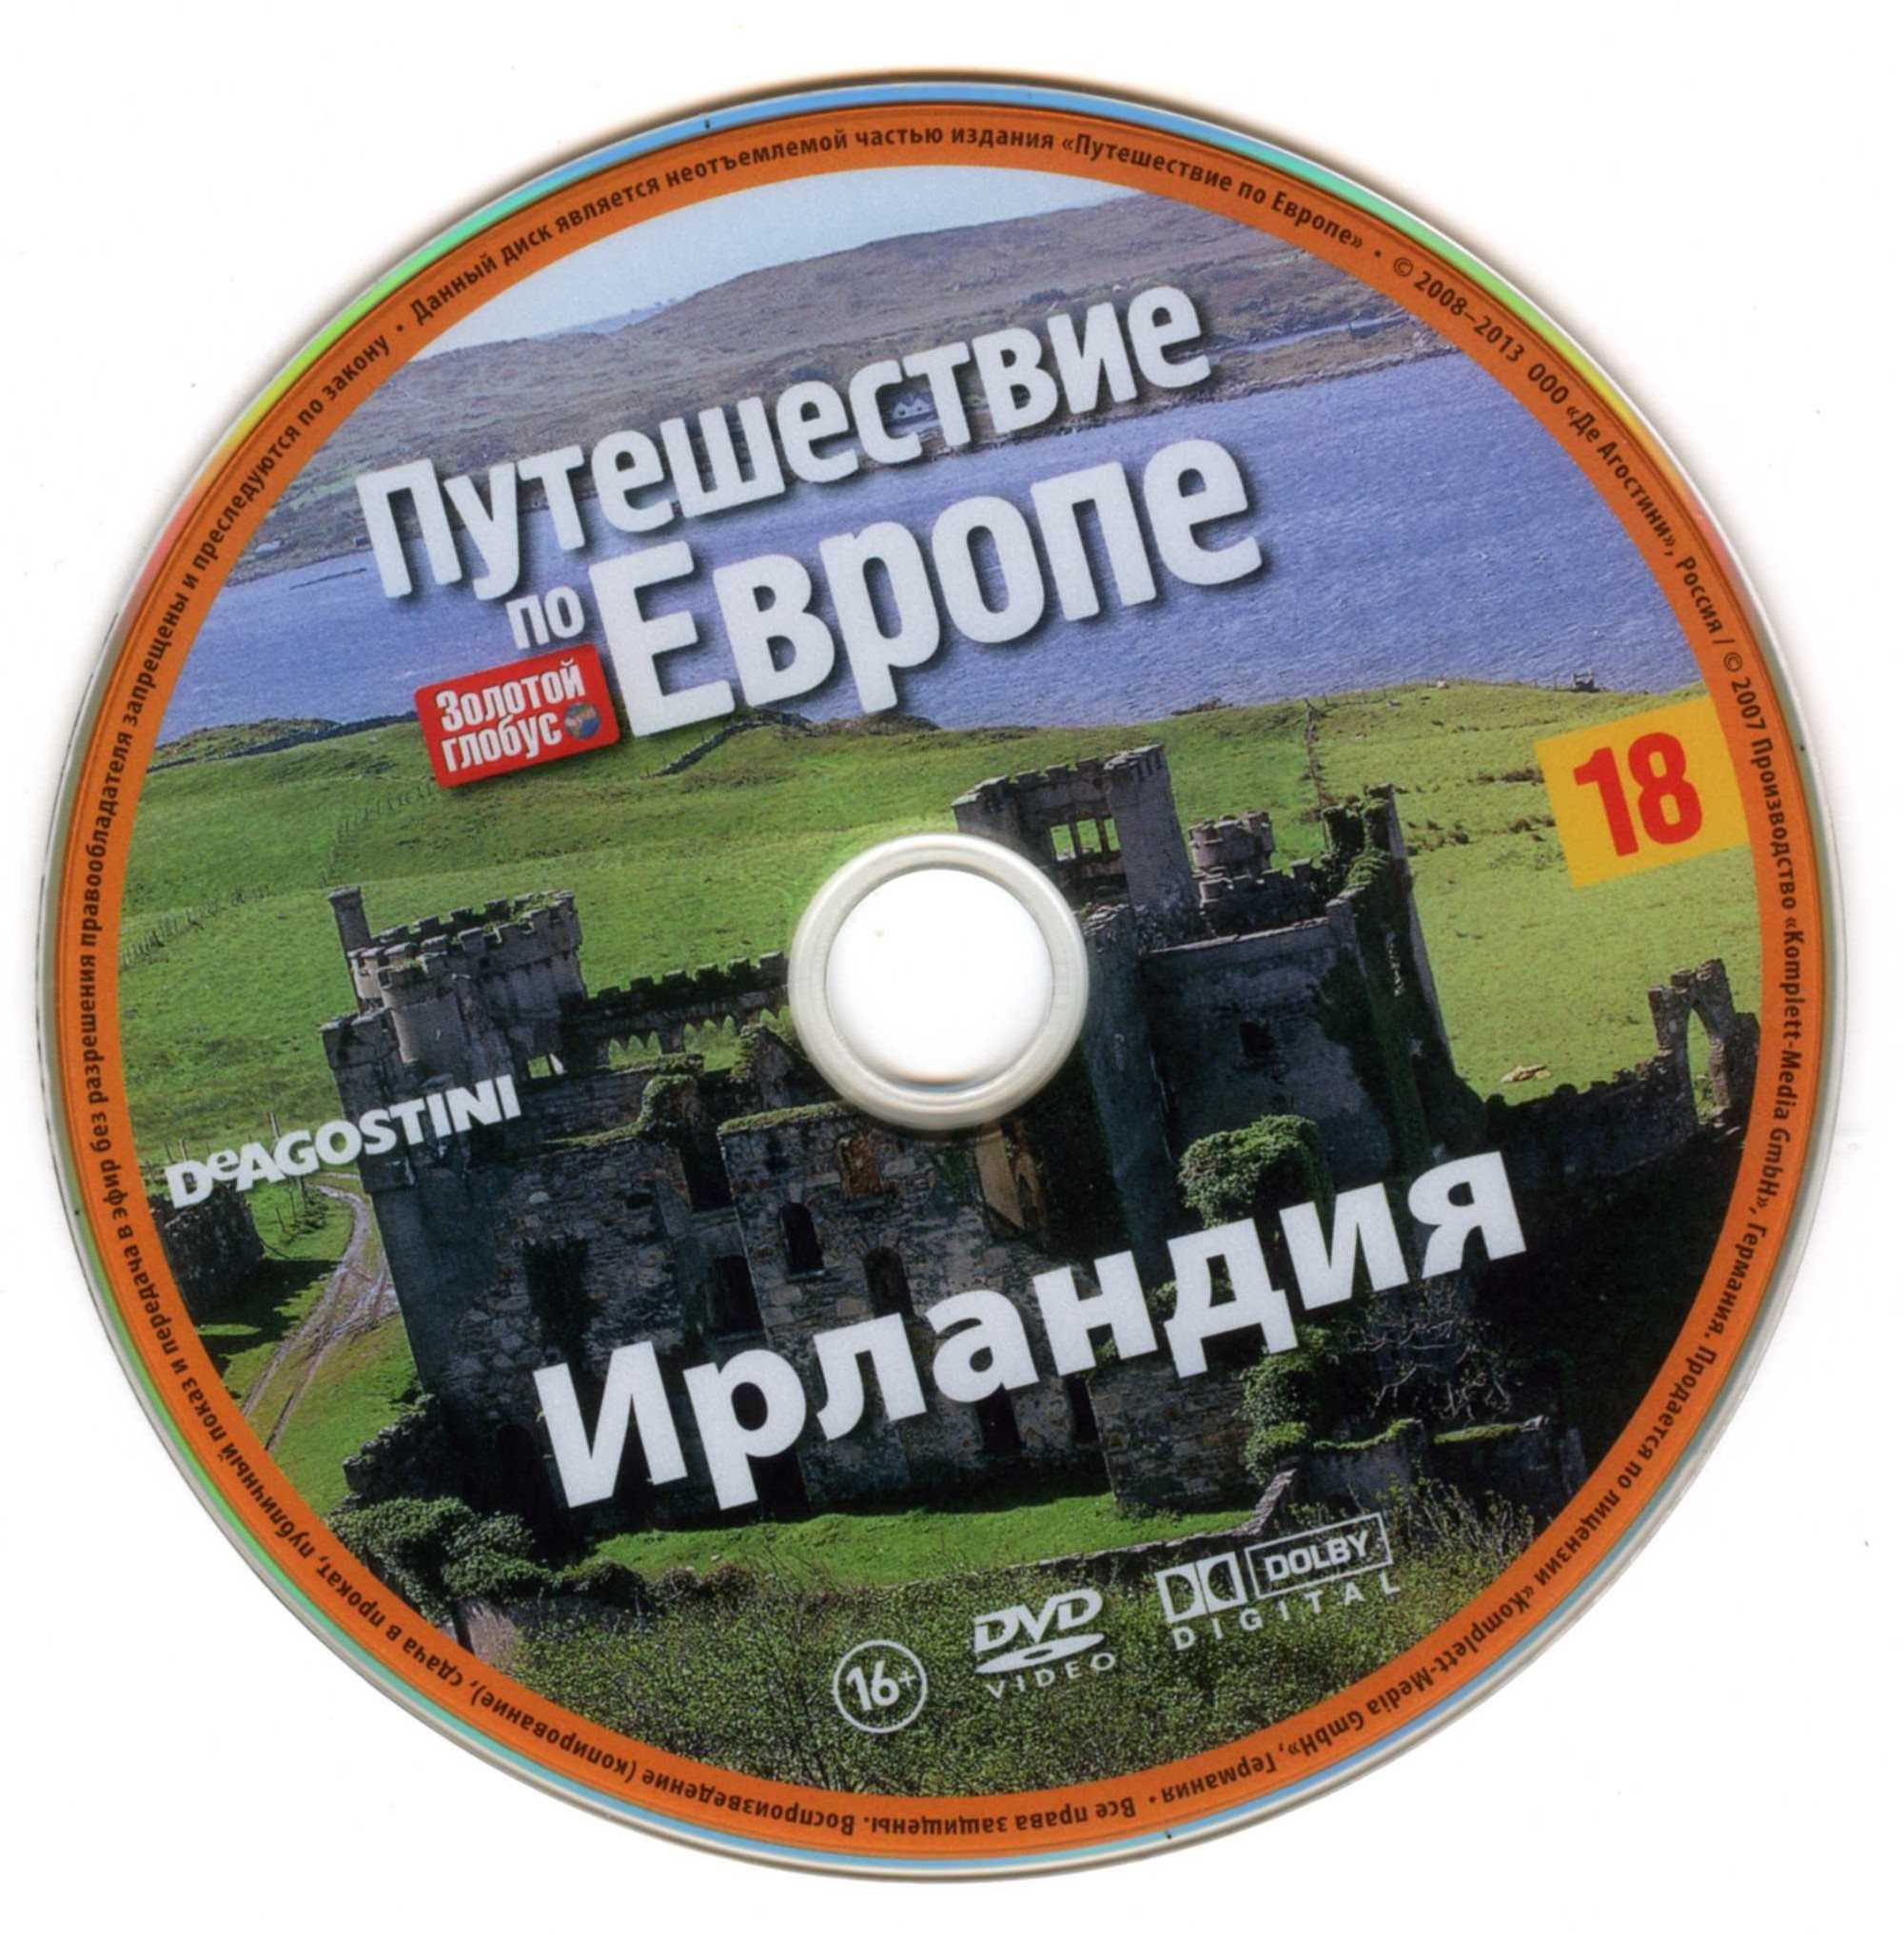 http://i4.imageban.ru/out/2013/06/03/2e79c5e74f7f126ec720c53e9d8accc5.jpg